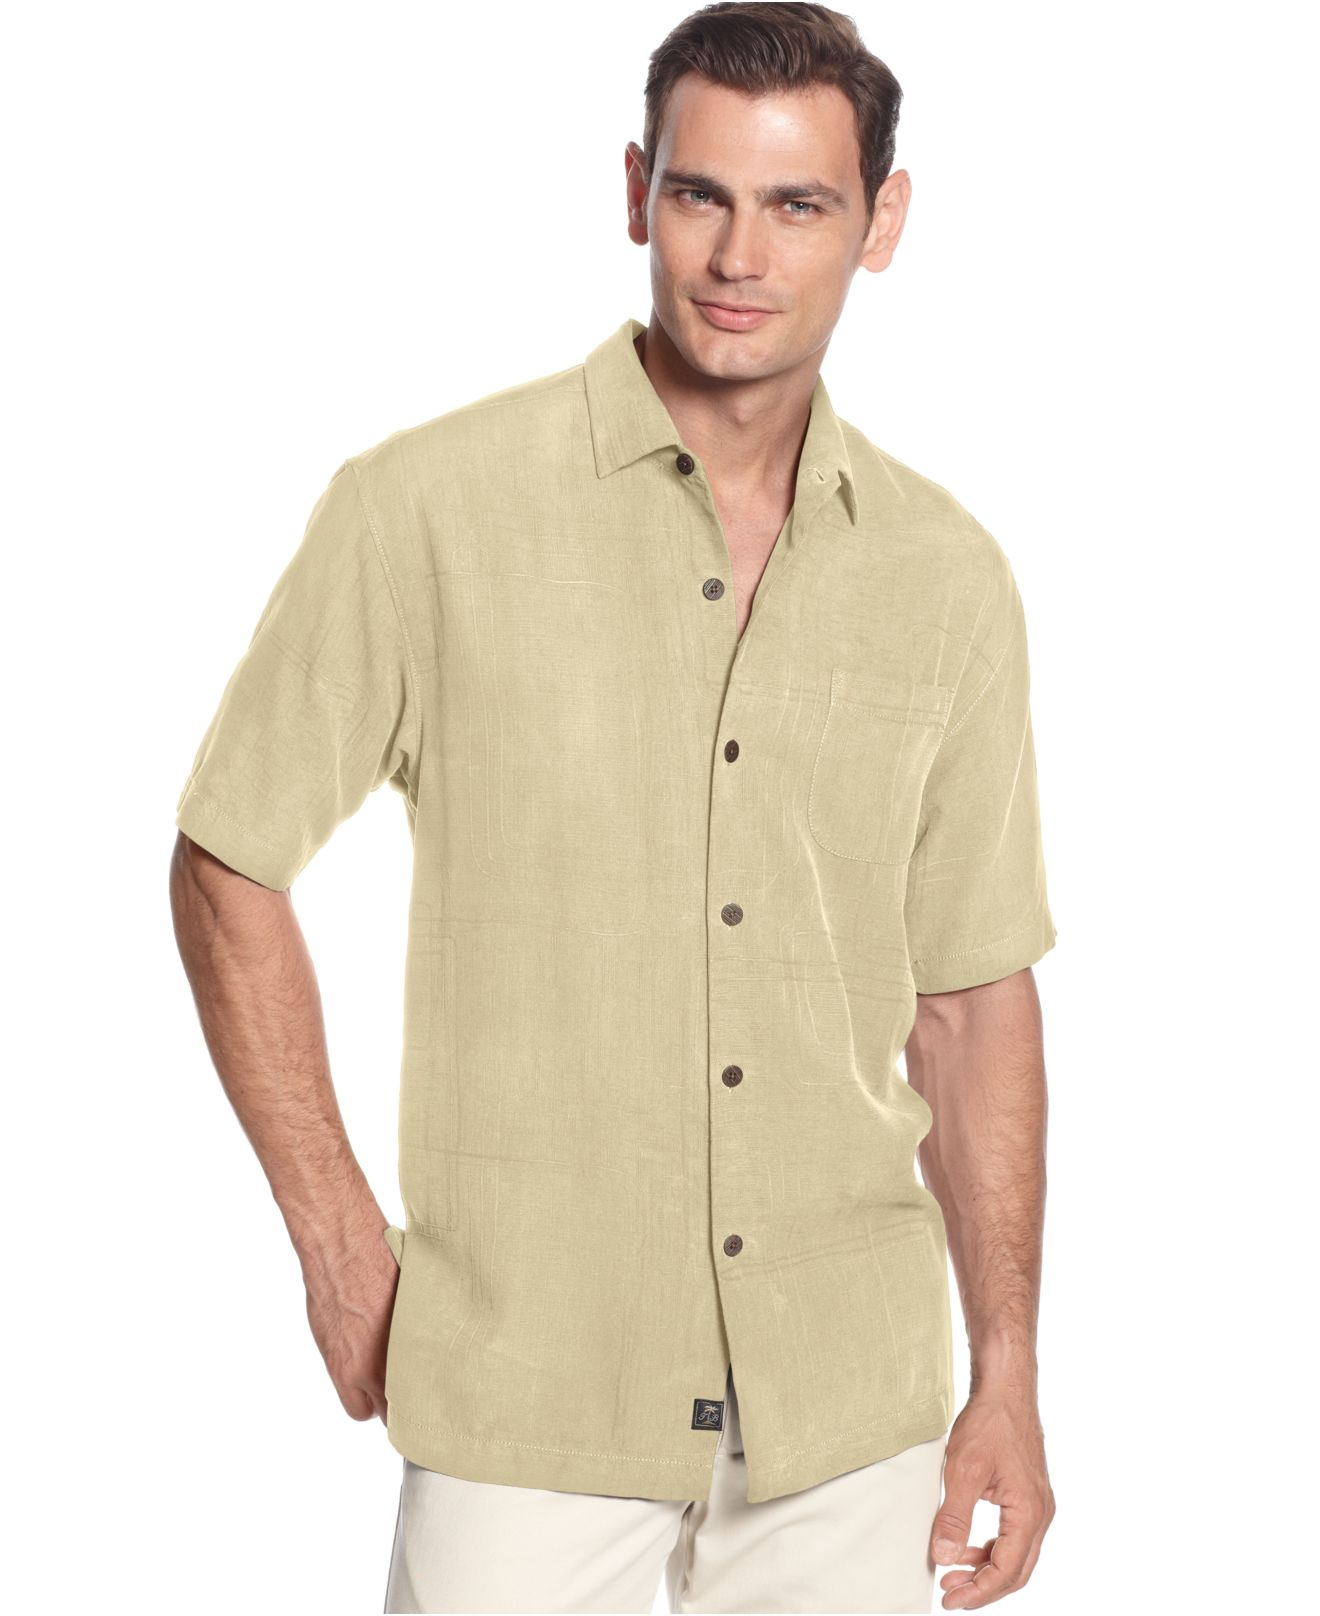 Tommy Bahama Island Geo Silk Shirt In Beige For Men Straw